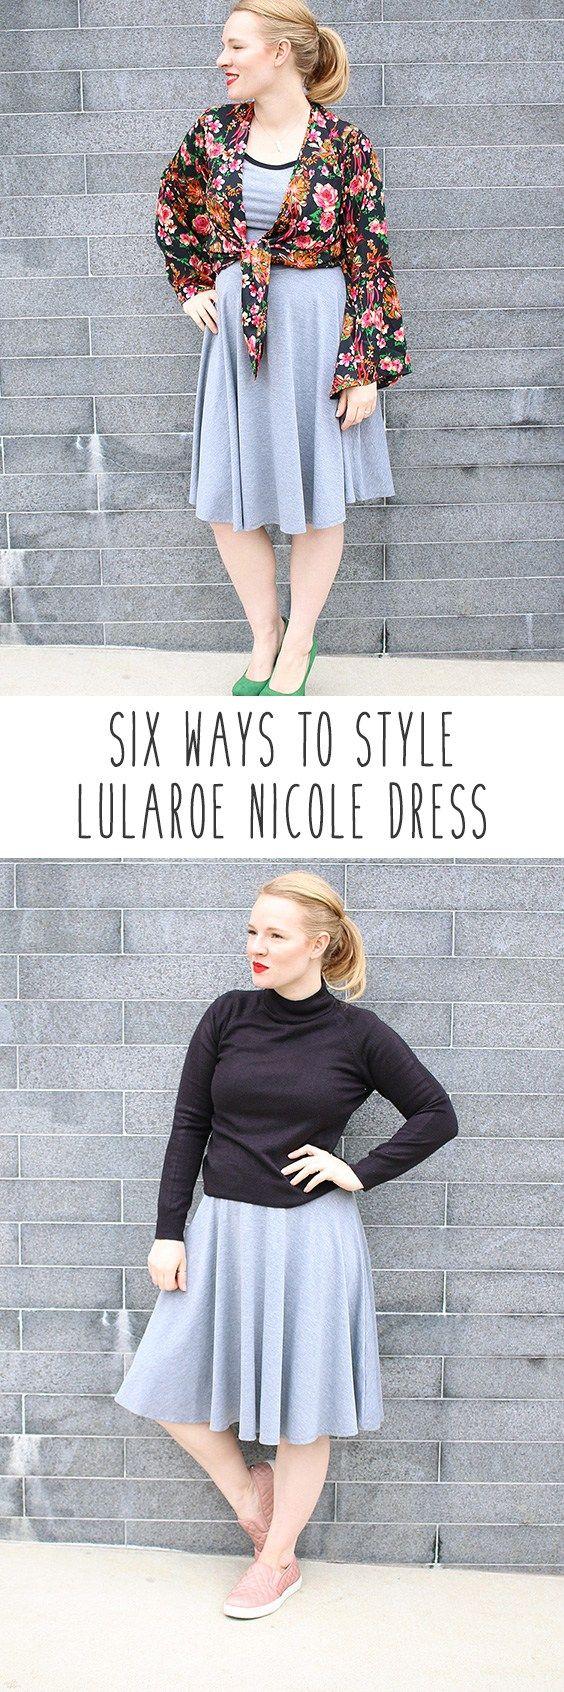 How to style Lularoe Nicole Dress! You love the Lularoe Nicole dress but can't figure out how to style it? LuLaRoe Nicole for work or play!